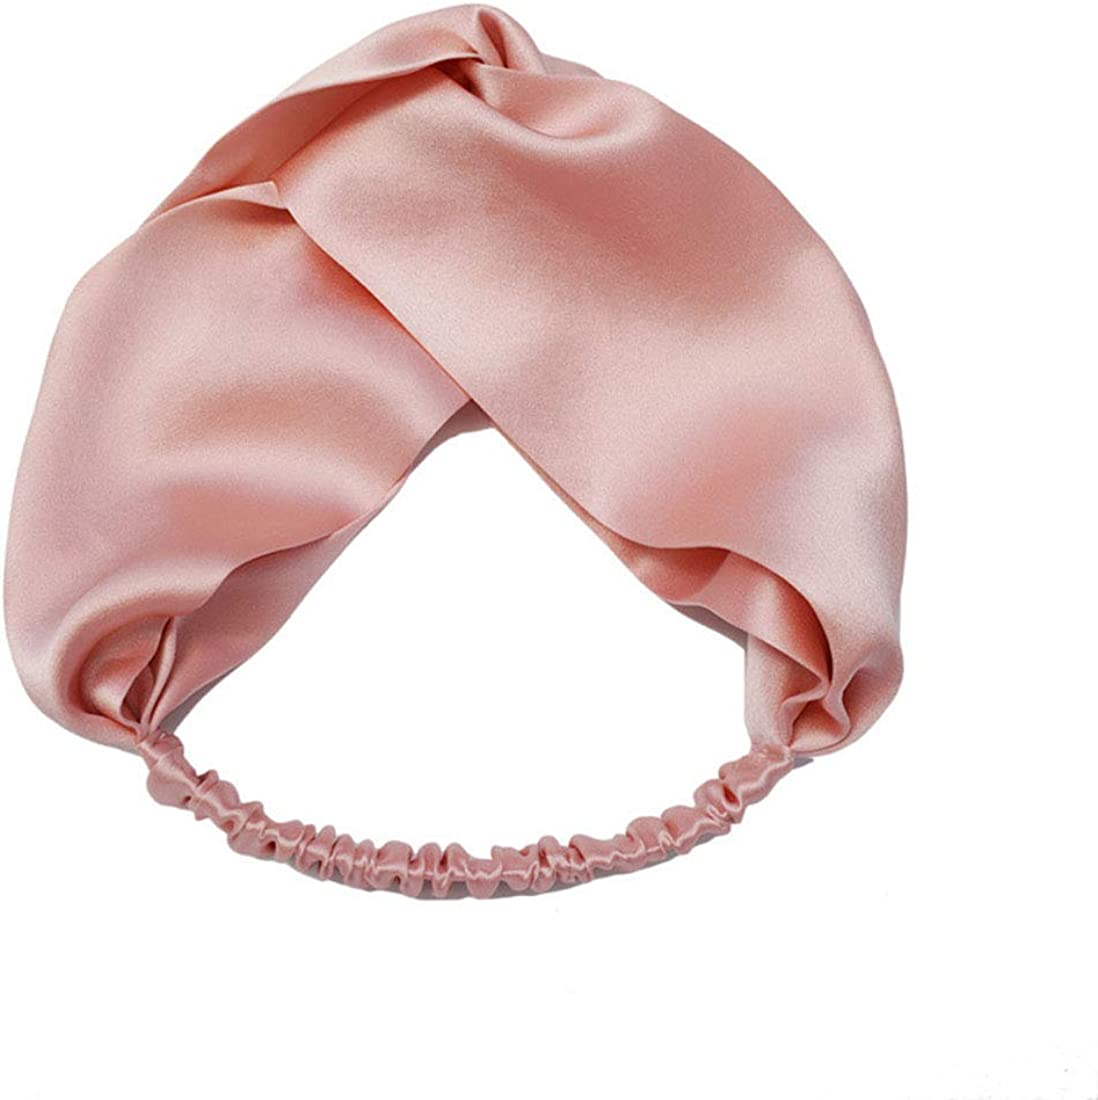 100% Mulberry Silk Head Wrap Elastic Headband Pink